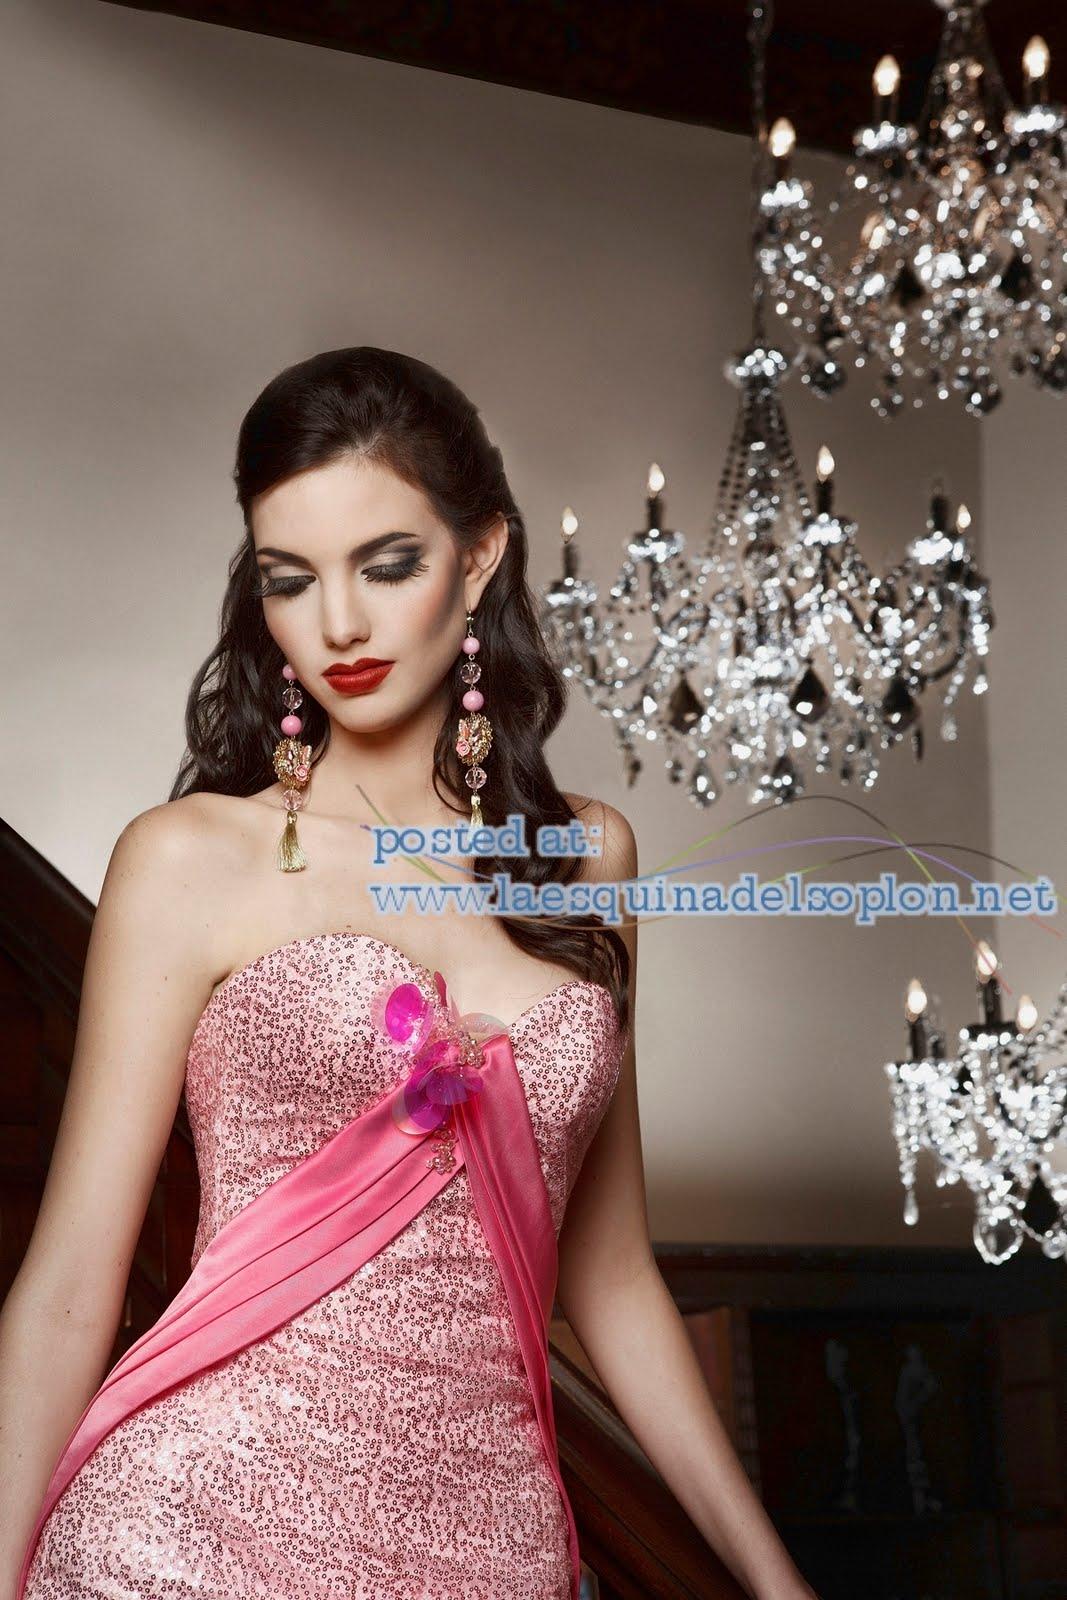 angela la padula, 3ra finalista de miss italia nel mondo 2011. Pjhqtnik